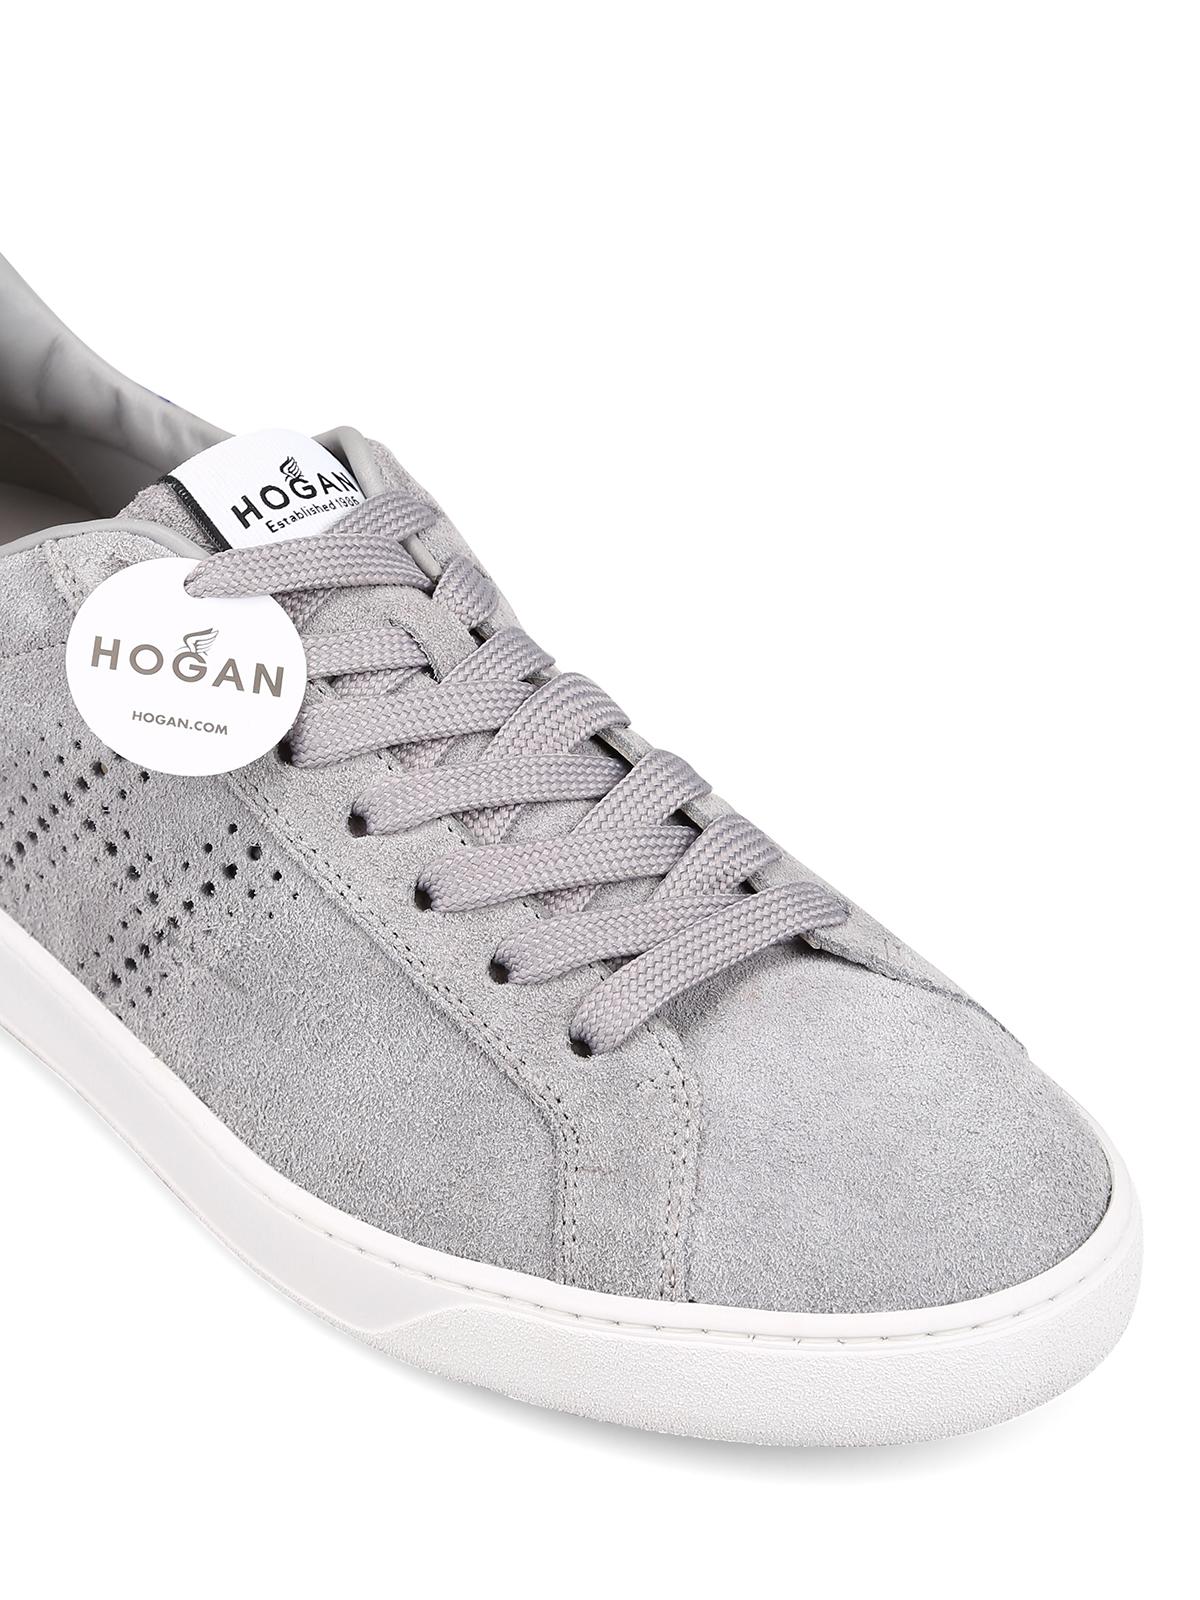 Hogan - H327 light grey sneakers - trainers - HXM3270BT10LK9278N